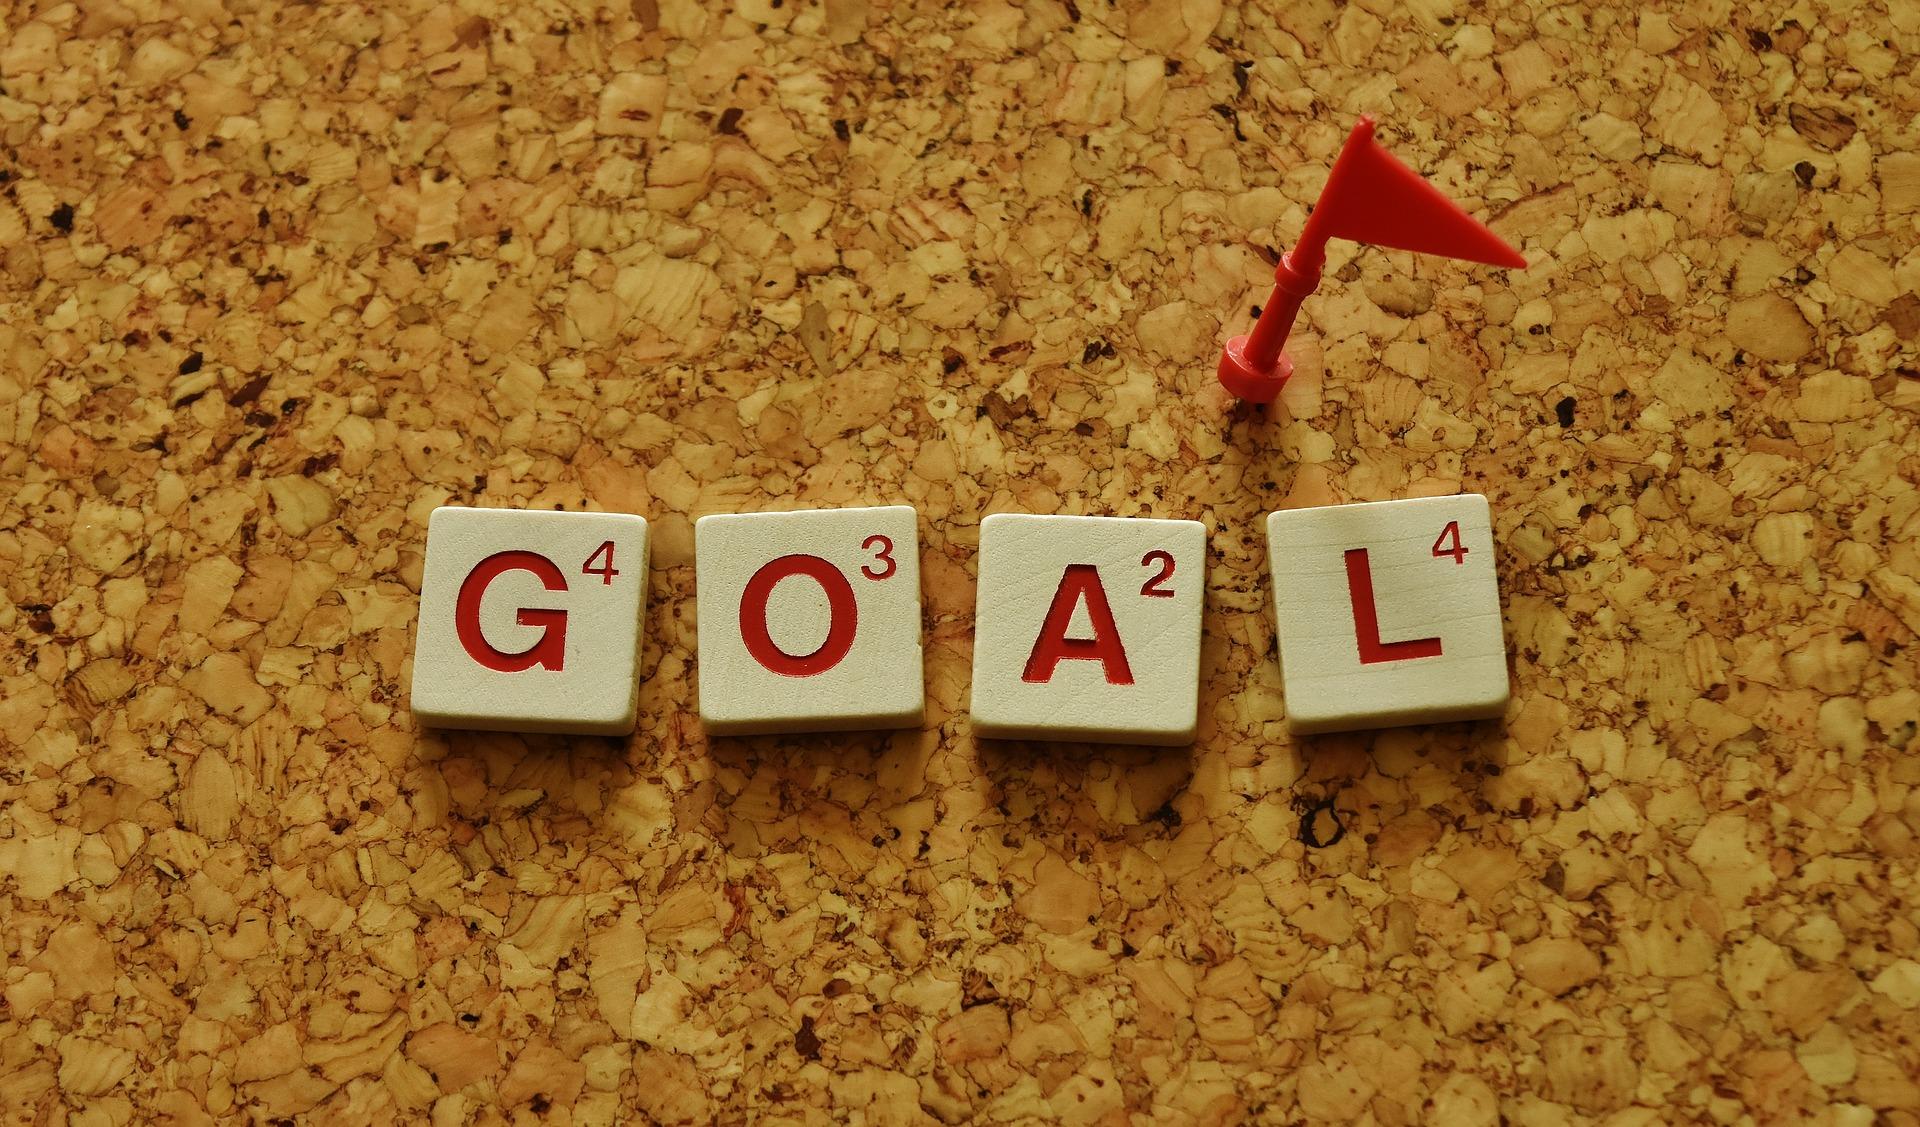 2020-04-01_goal